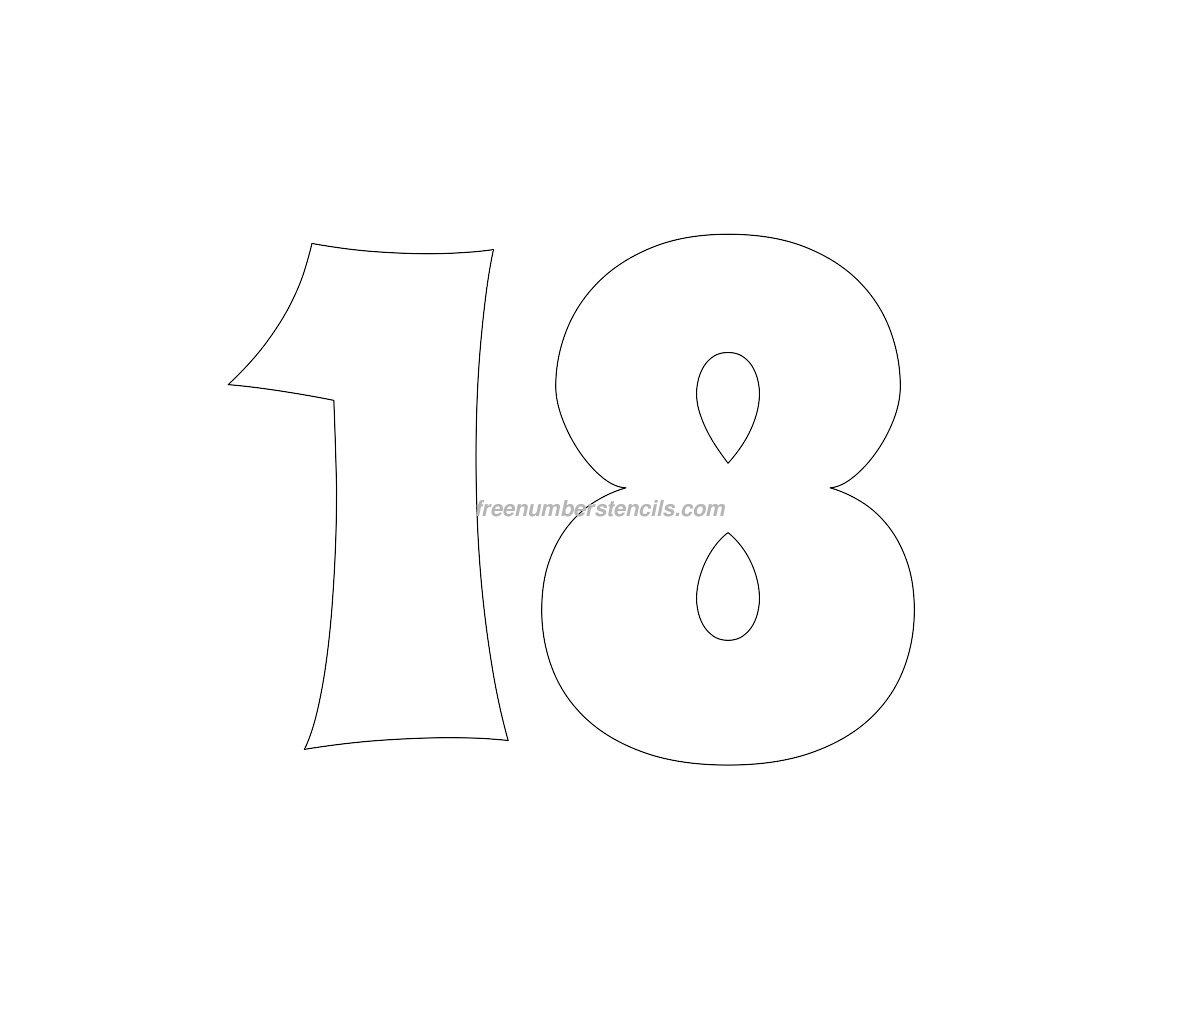 Free Groovy 18 Number Stencil Freenumberstencils – Number Template